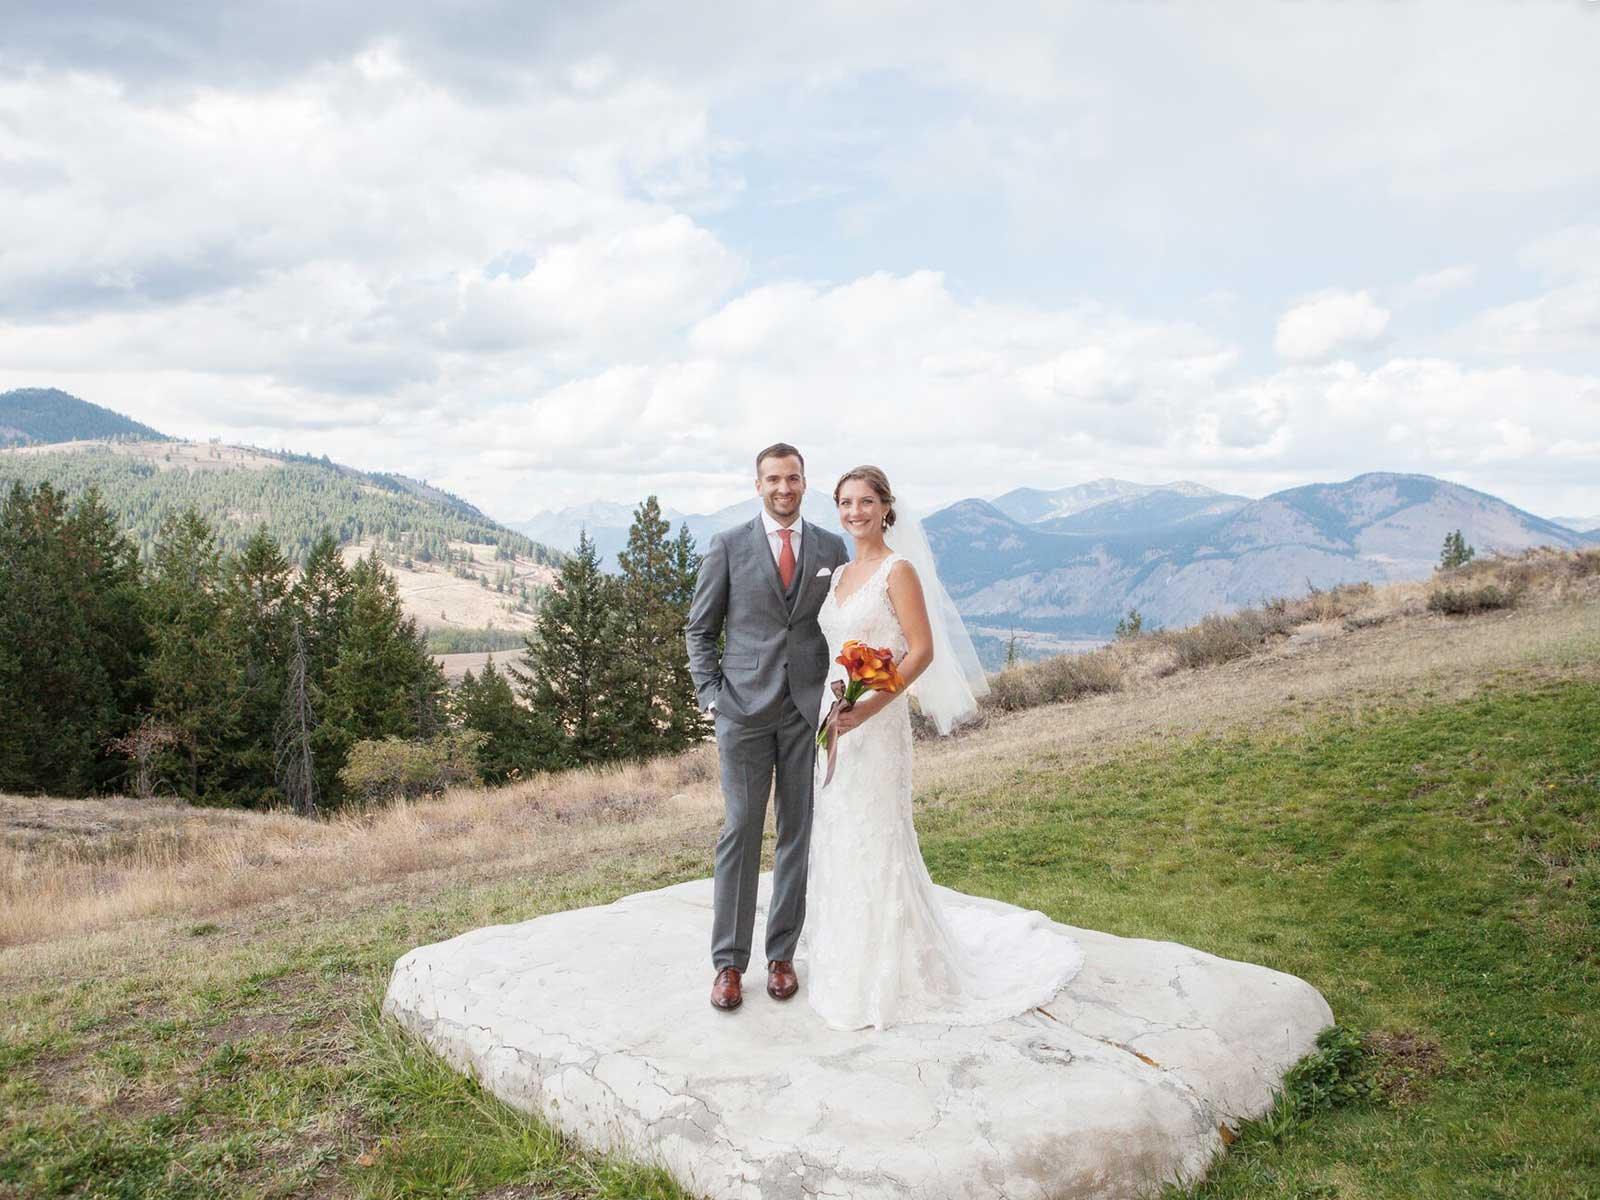 bride and groom on stone platform